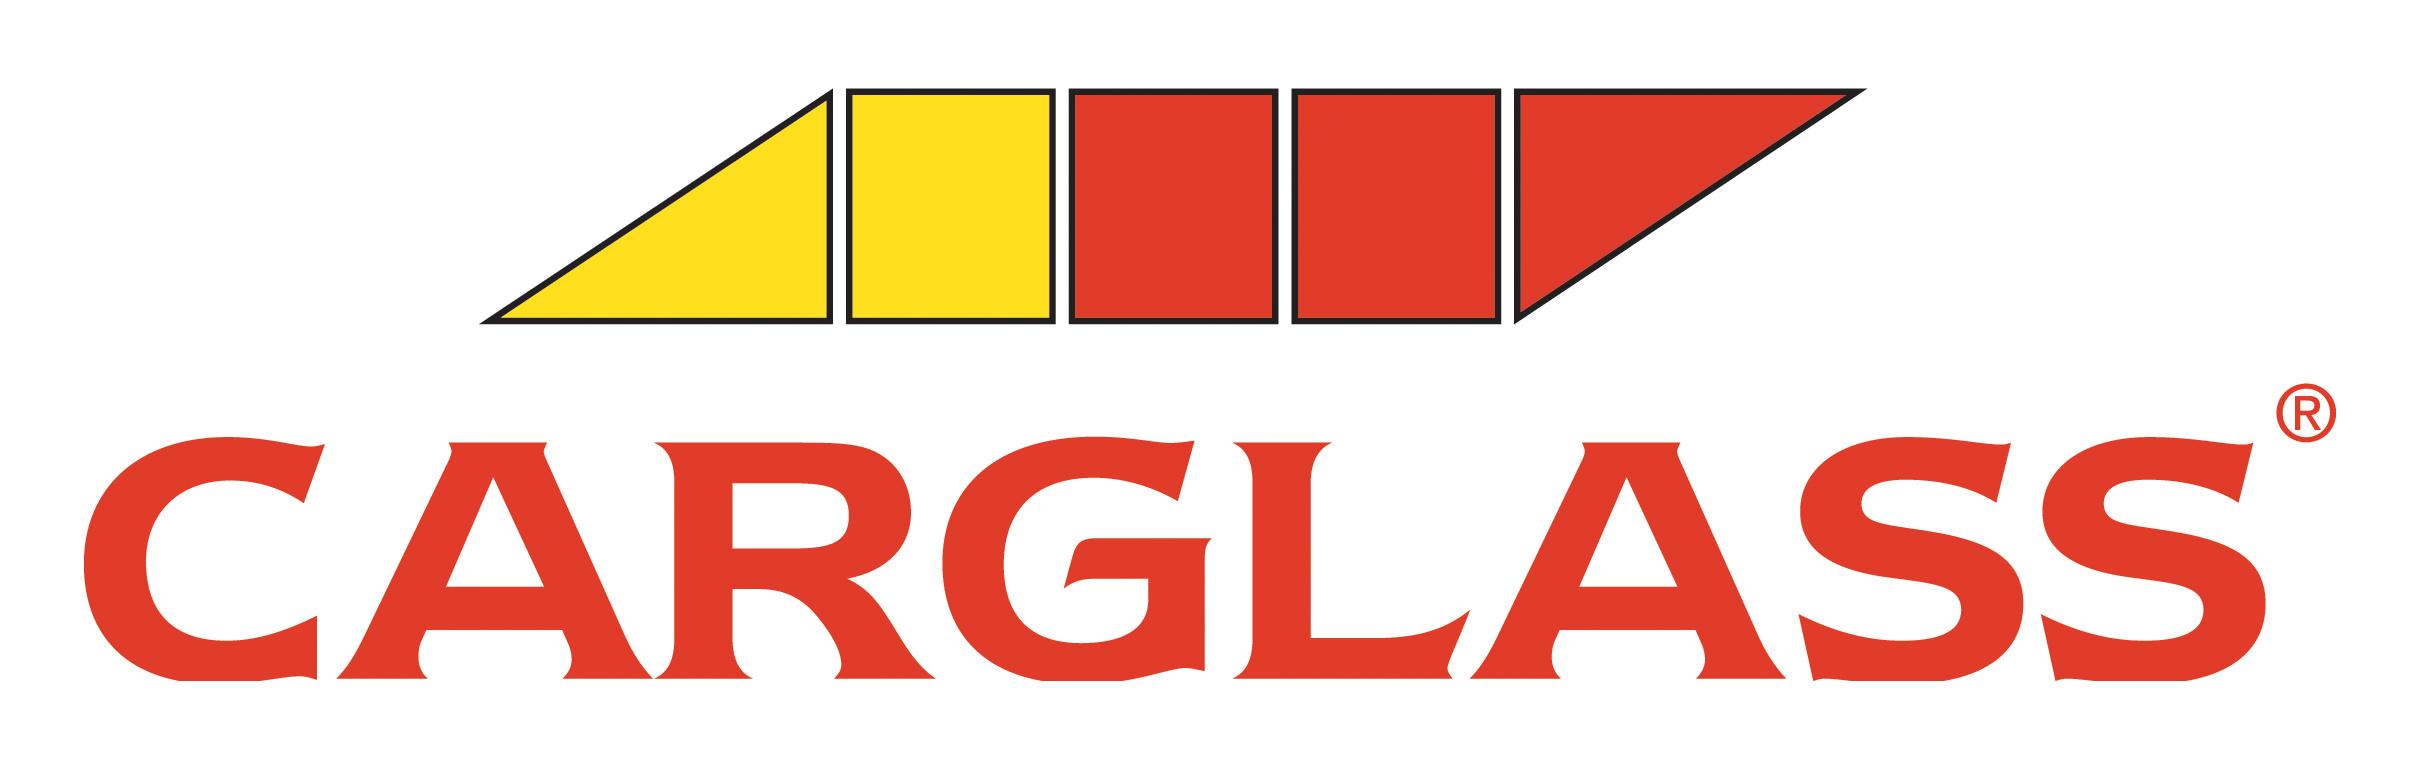 CARGLASS_LOGO_RGB